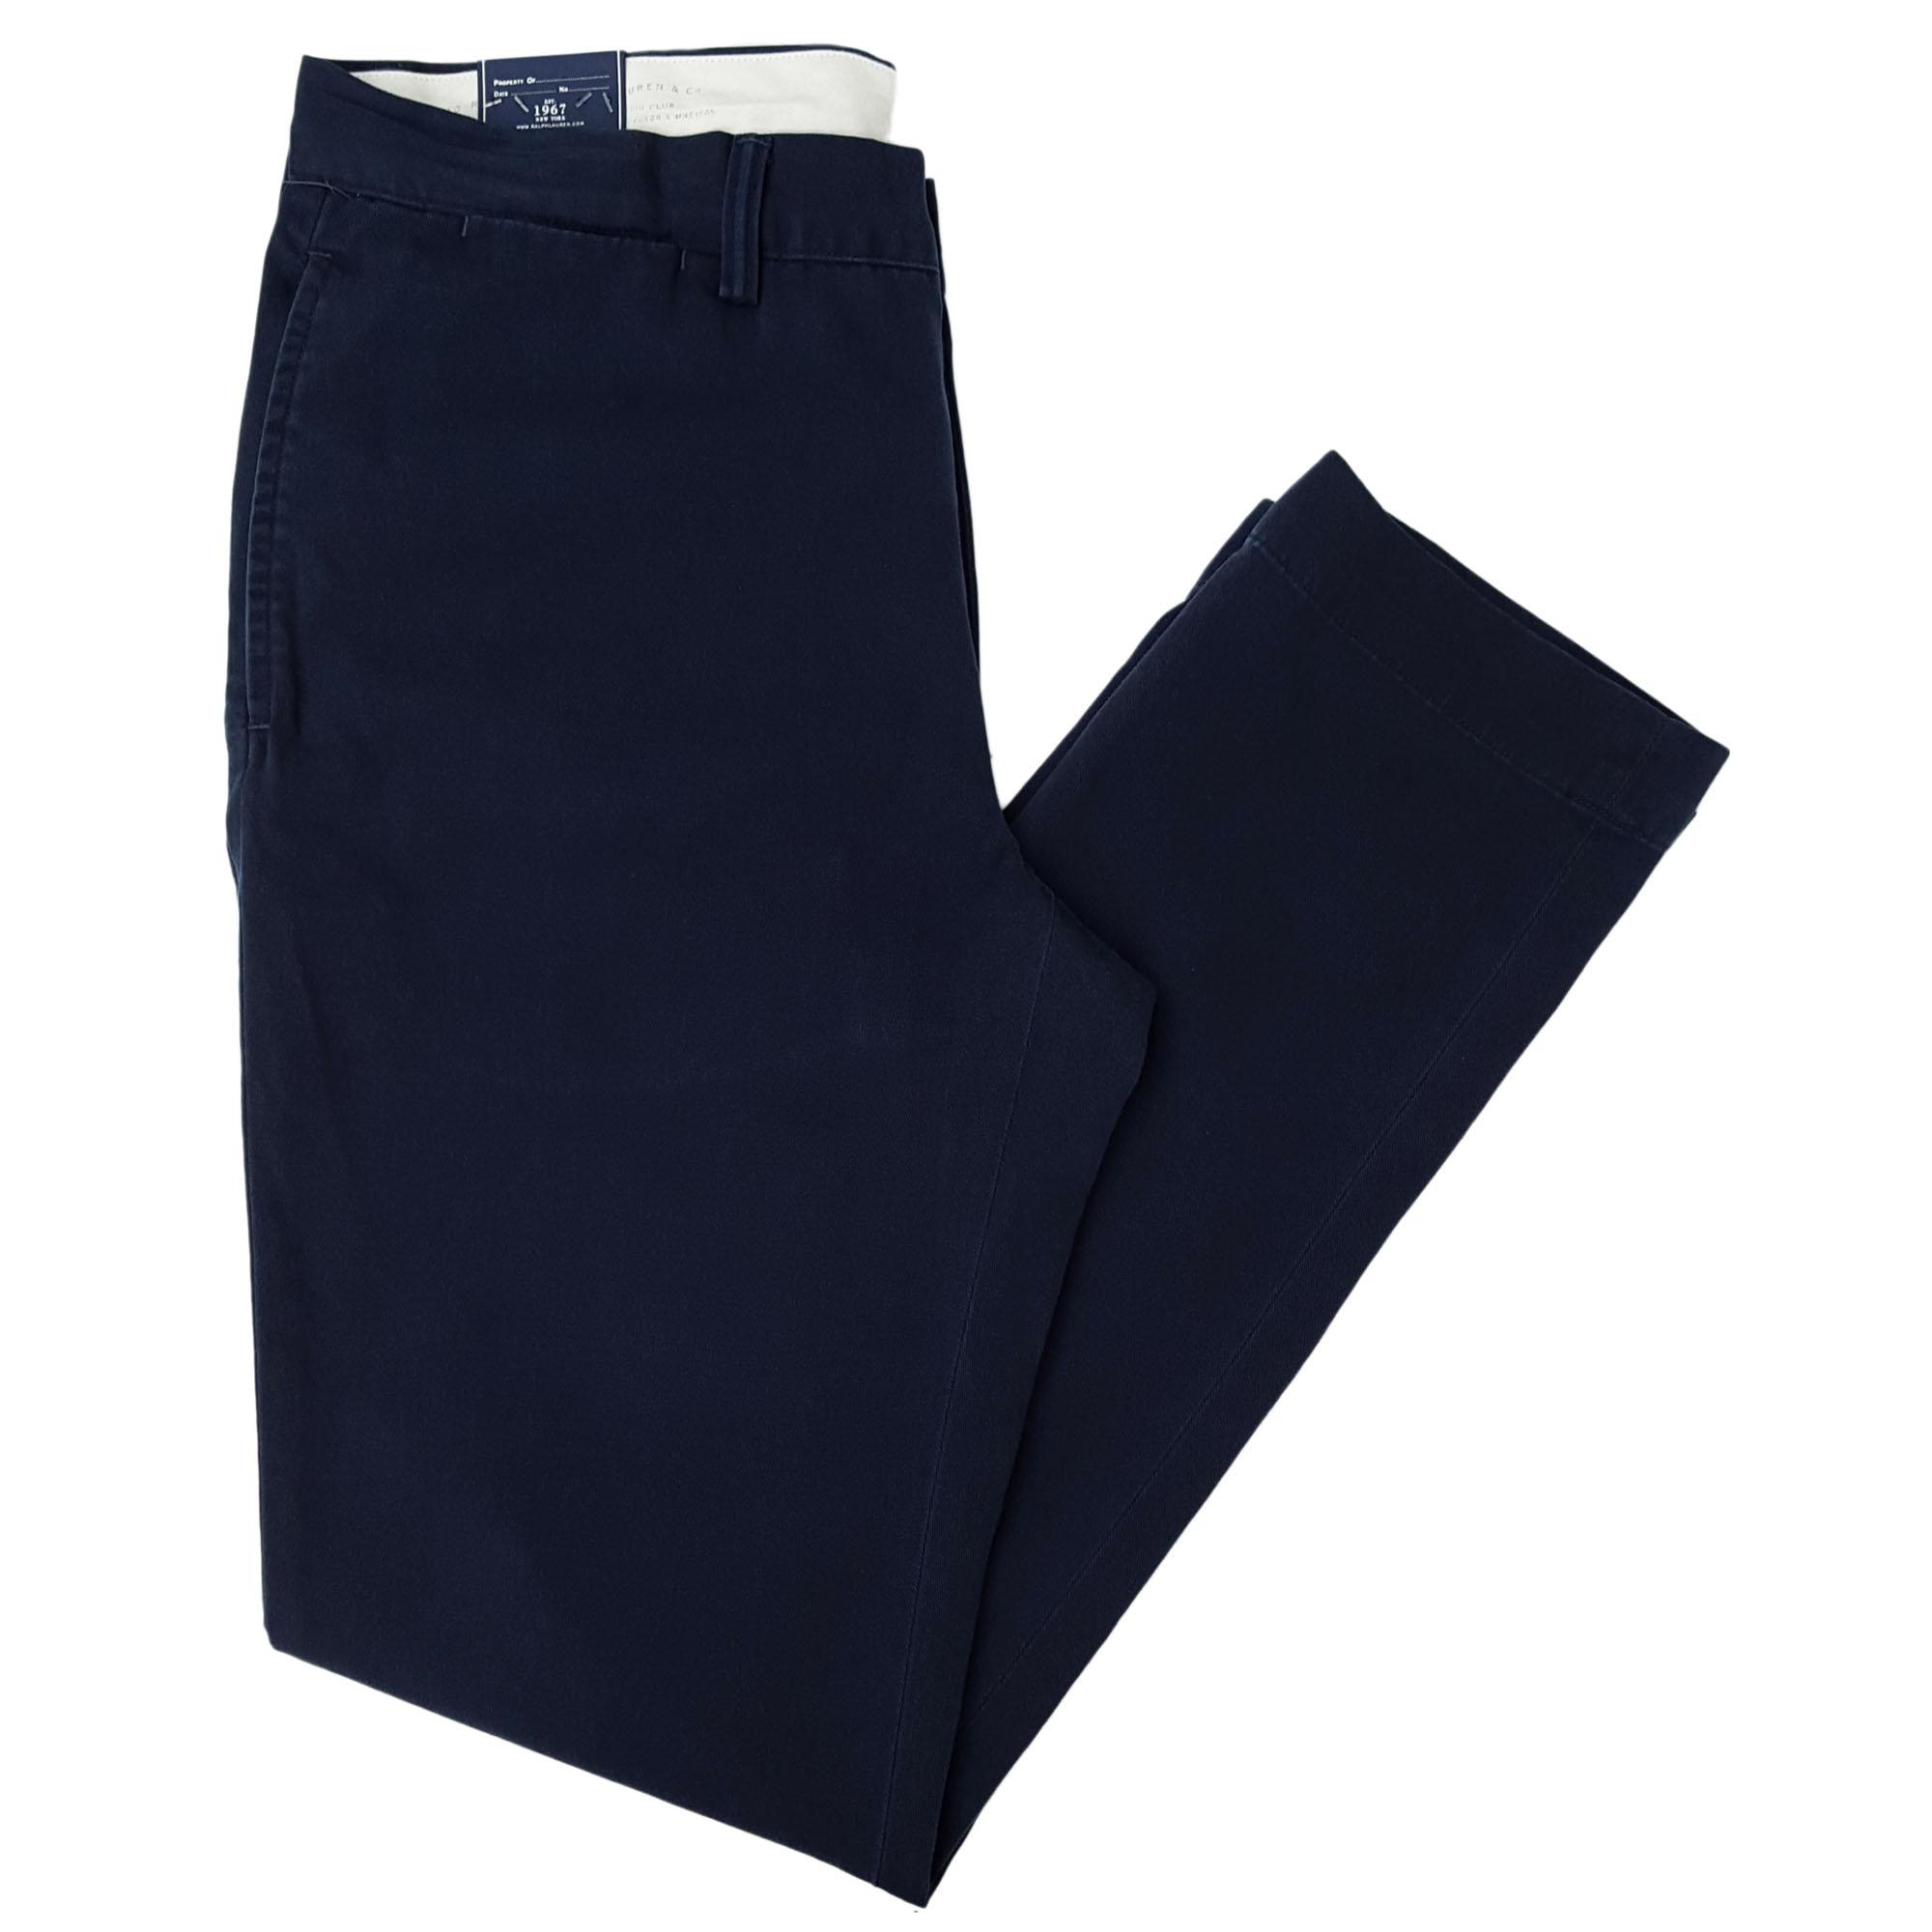 2b8ee5d480a7 Polo Ralph Lauren Men's Slim-Fit Bedford Chino Pants | eBay